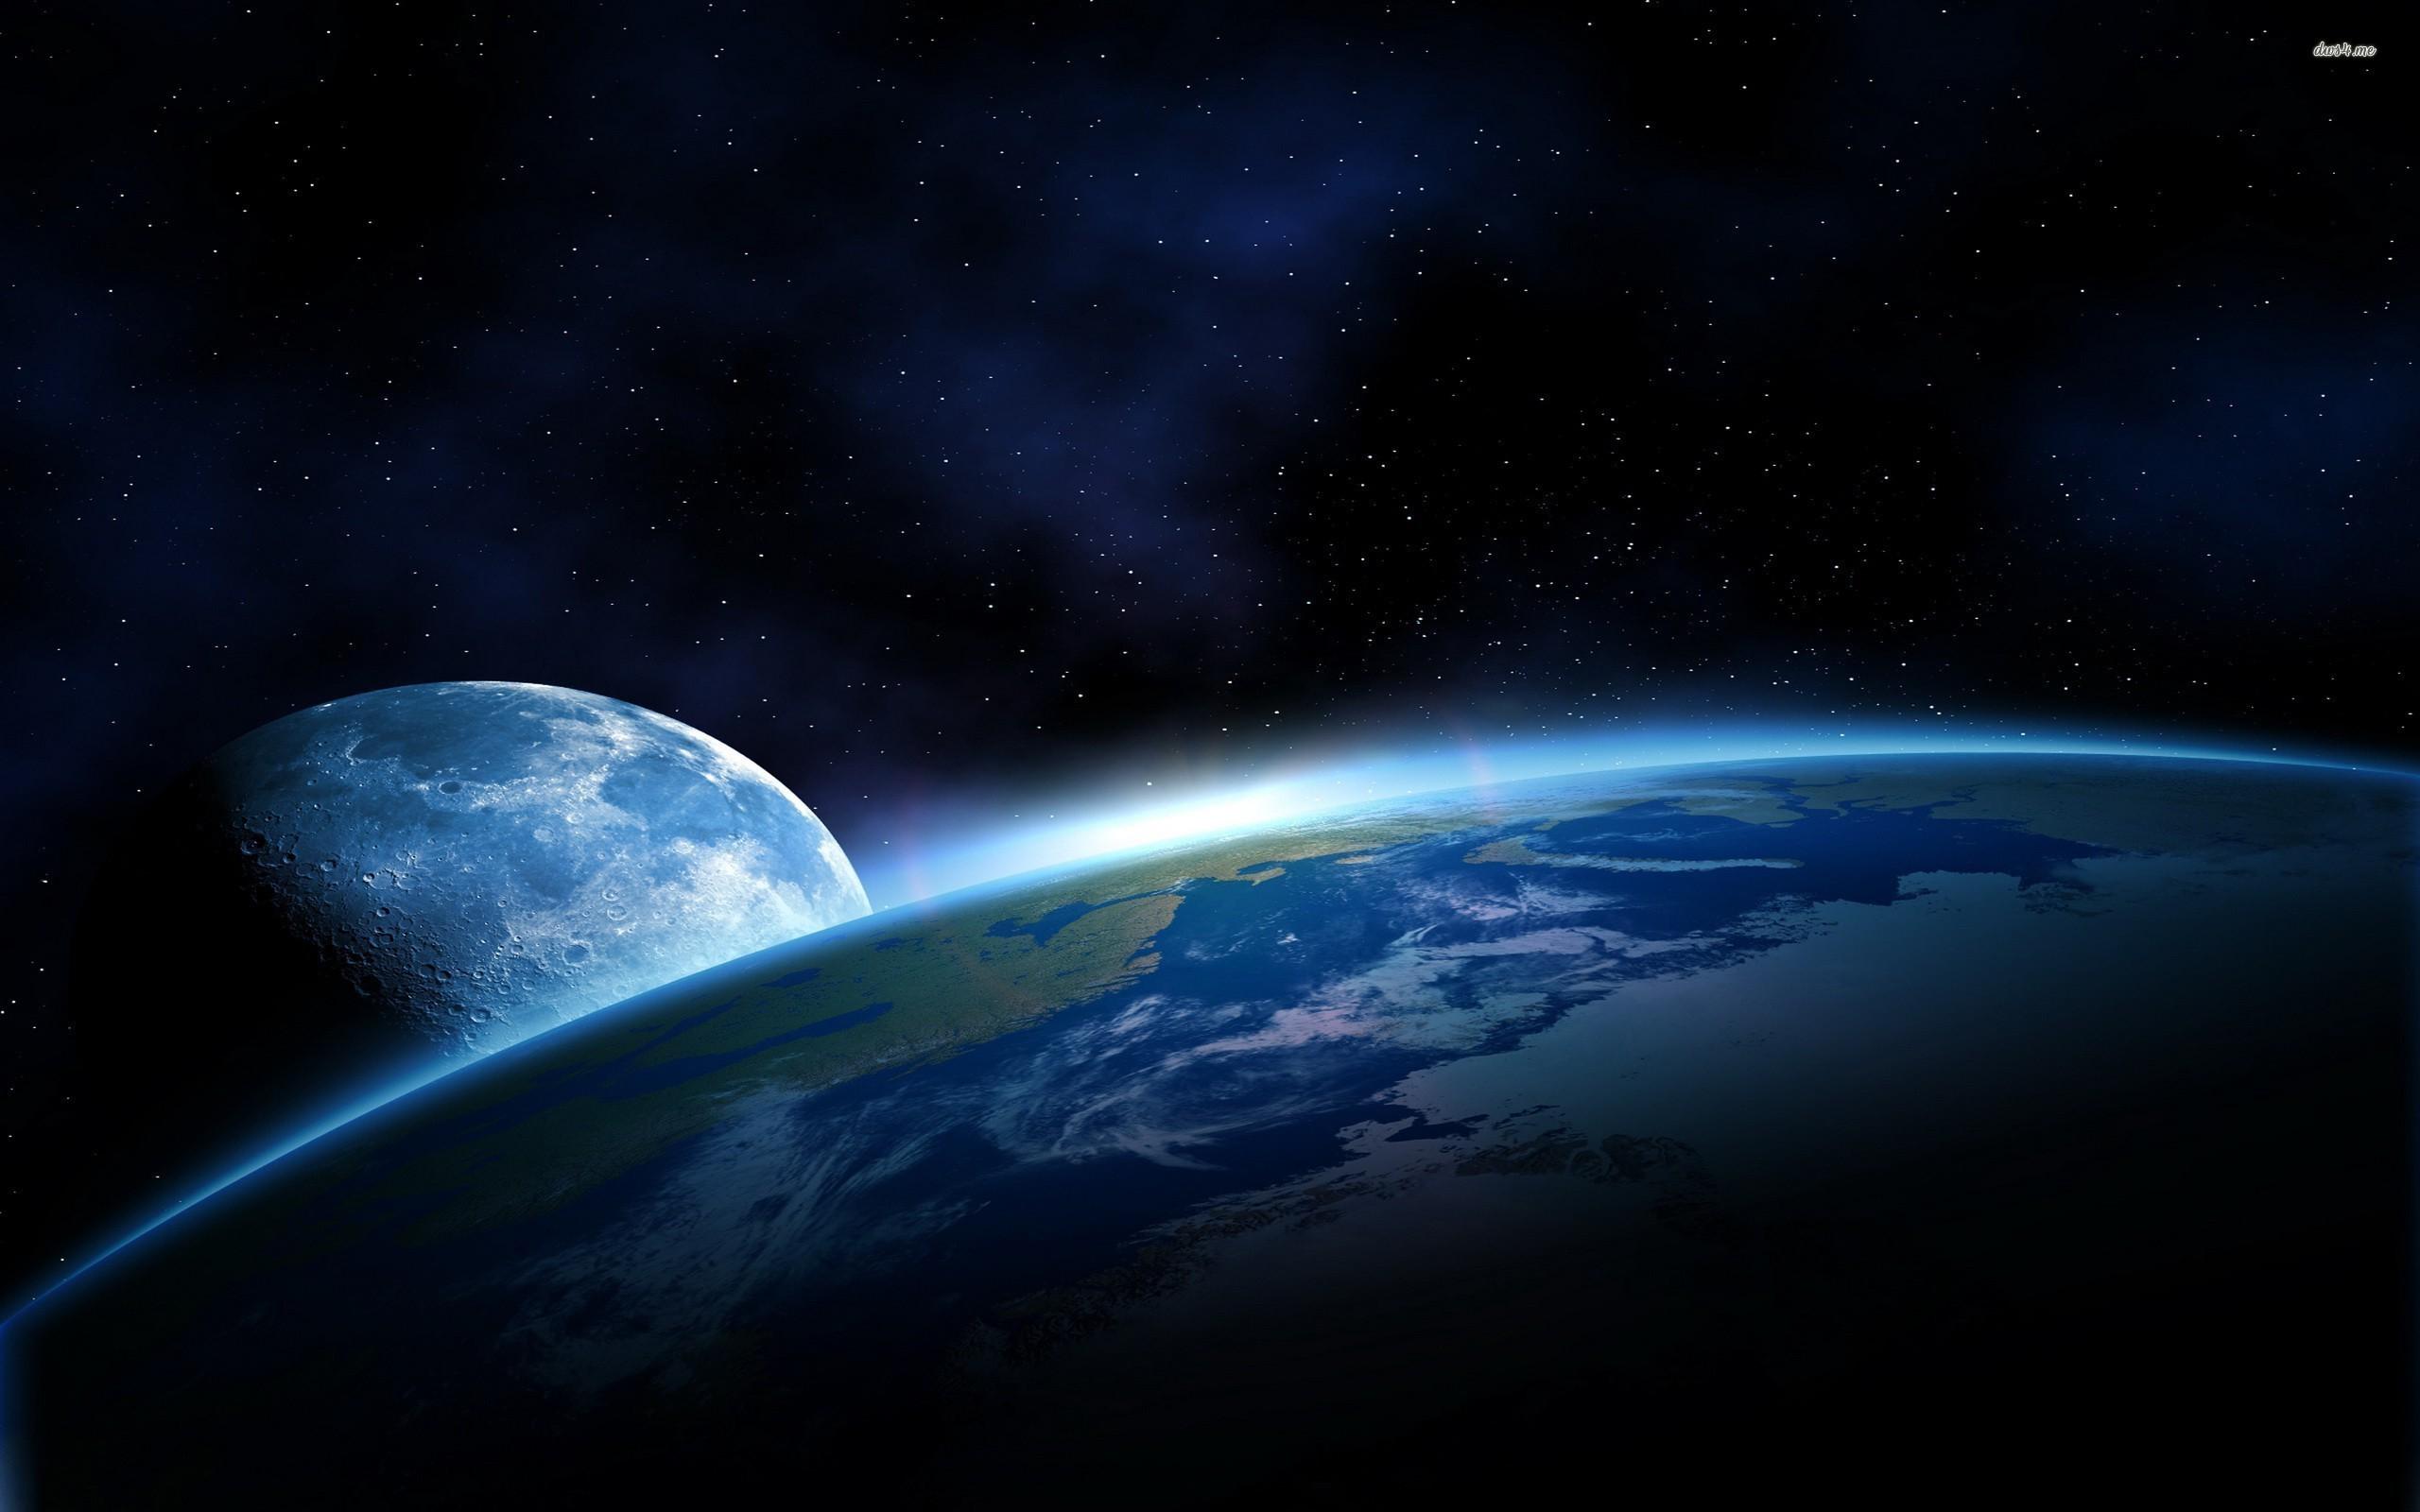 Moon photos from earth dowload